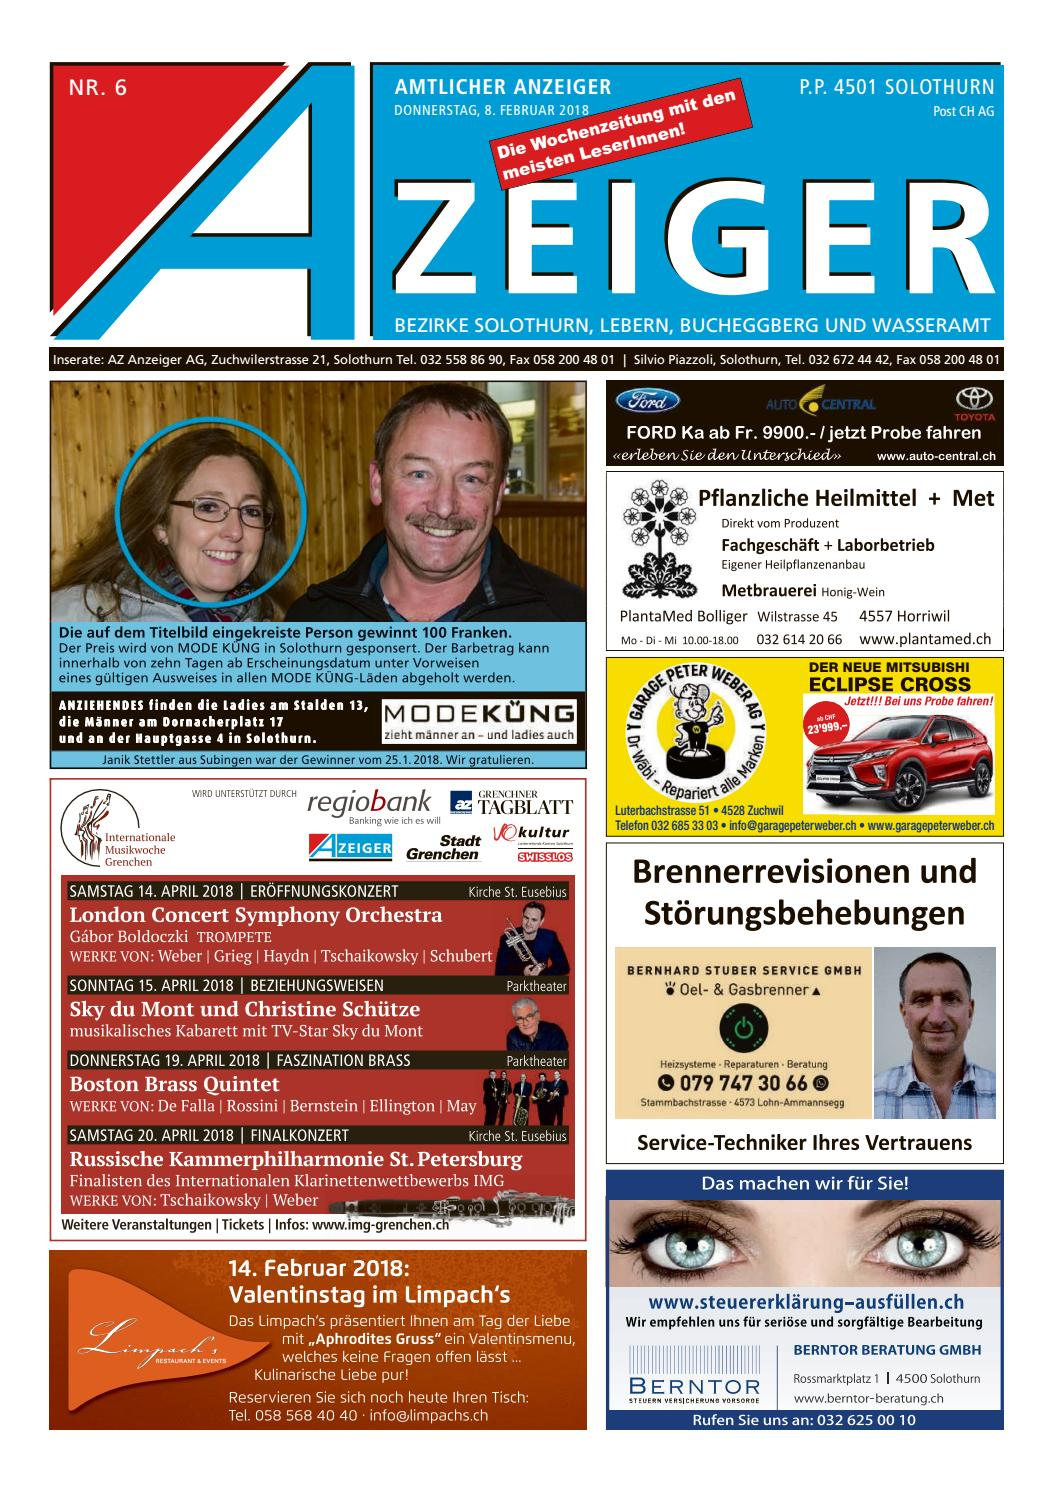 Azeiger 06 2018 by AZ-Anzeiger - issuu